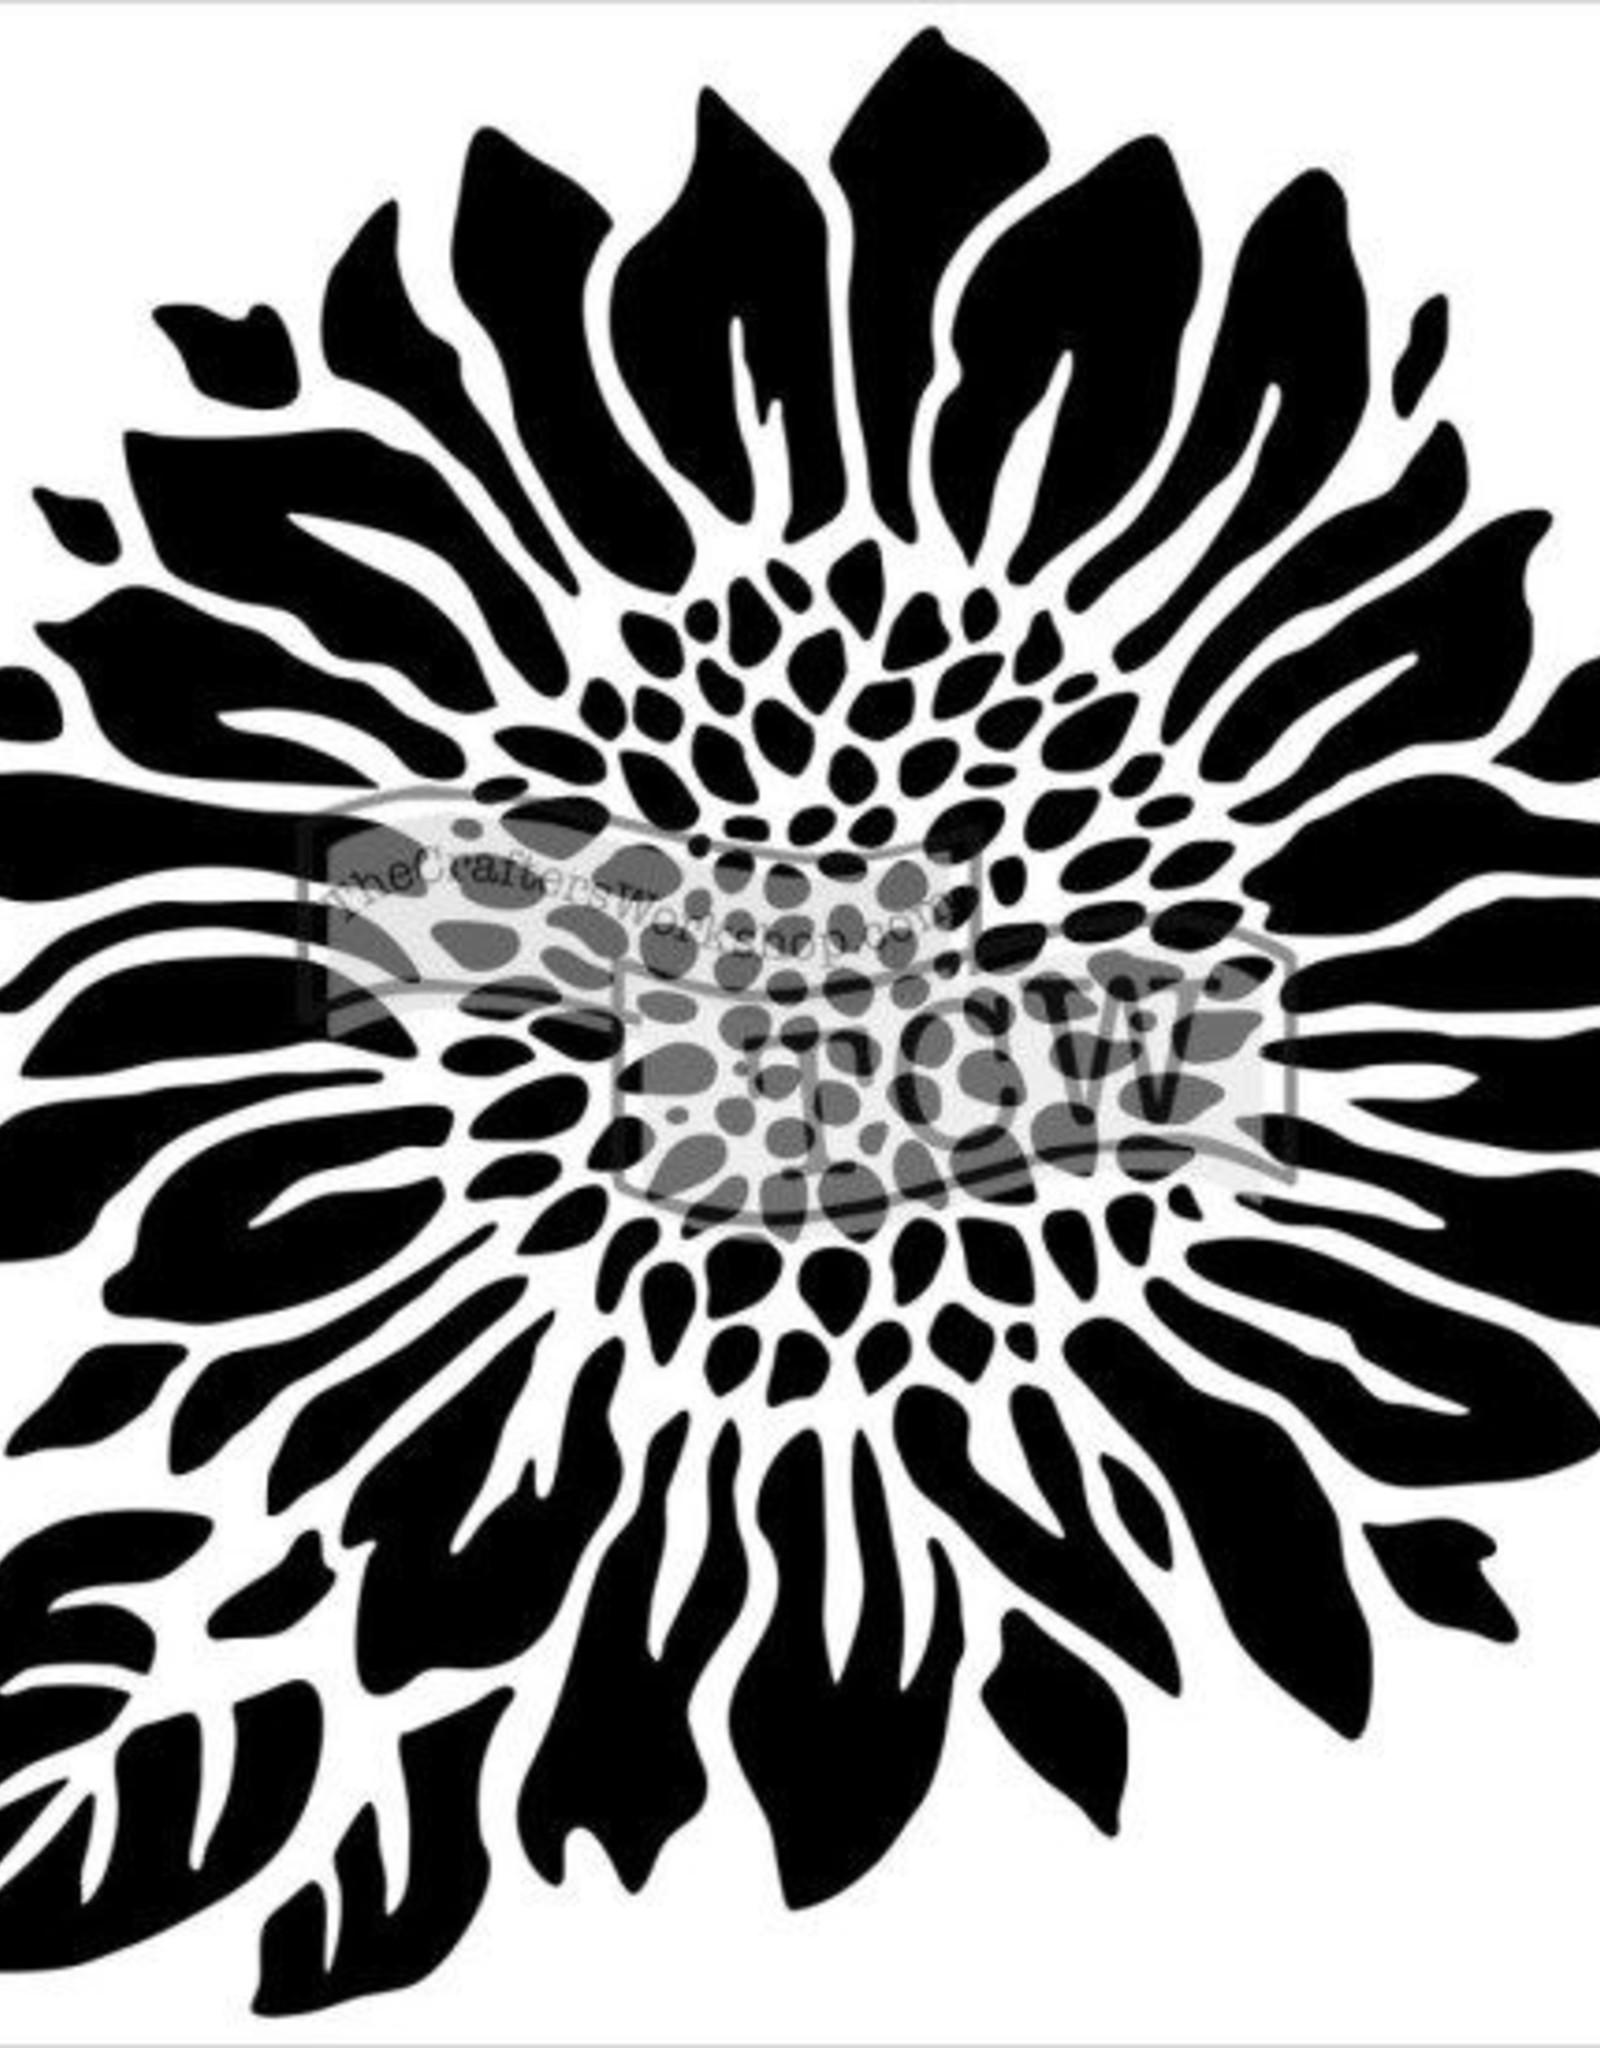 Stencil Joyful Sunflower